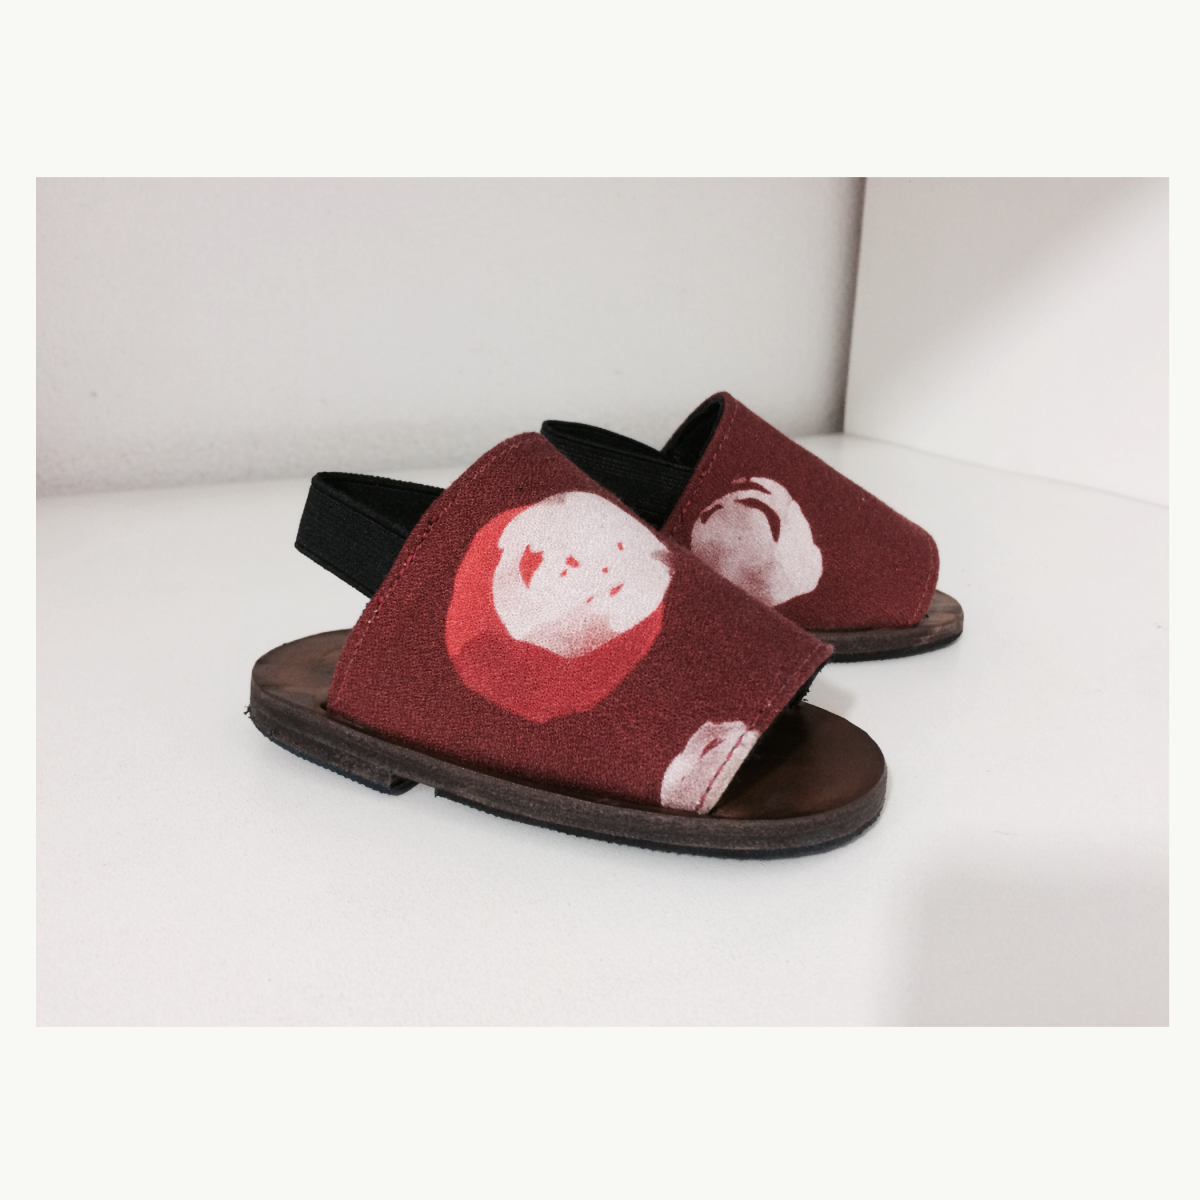 Chinelo Itália Miniatura Van Cleve Vermelho